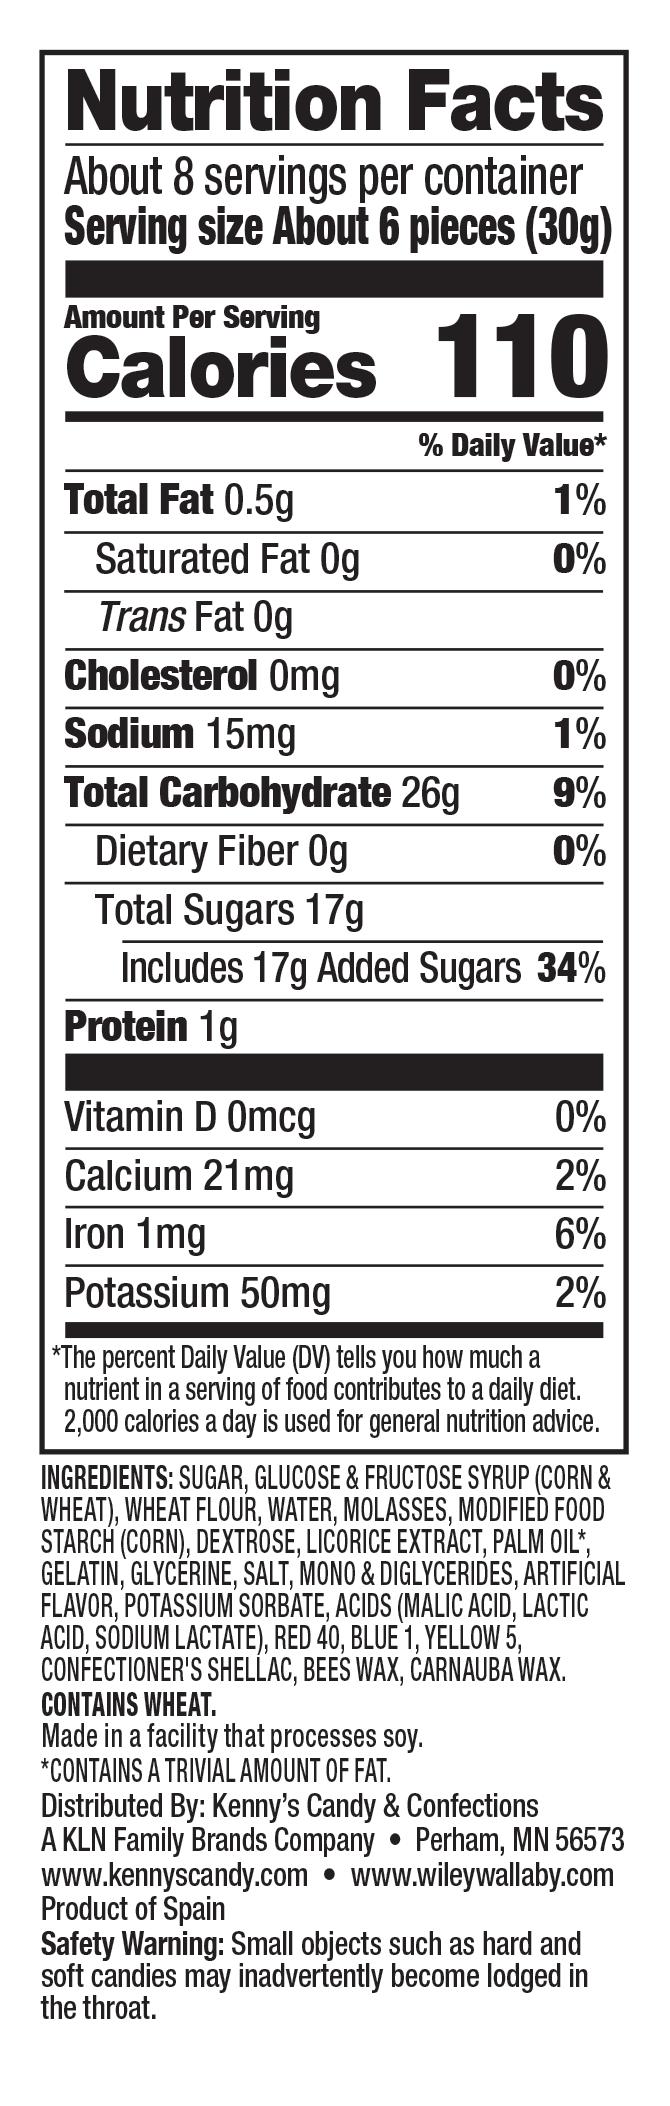 Nutrition Facts: Allsorts